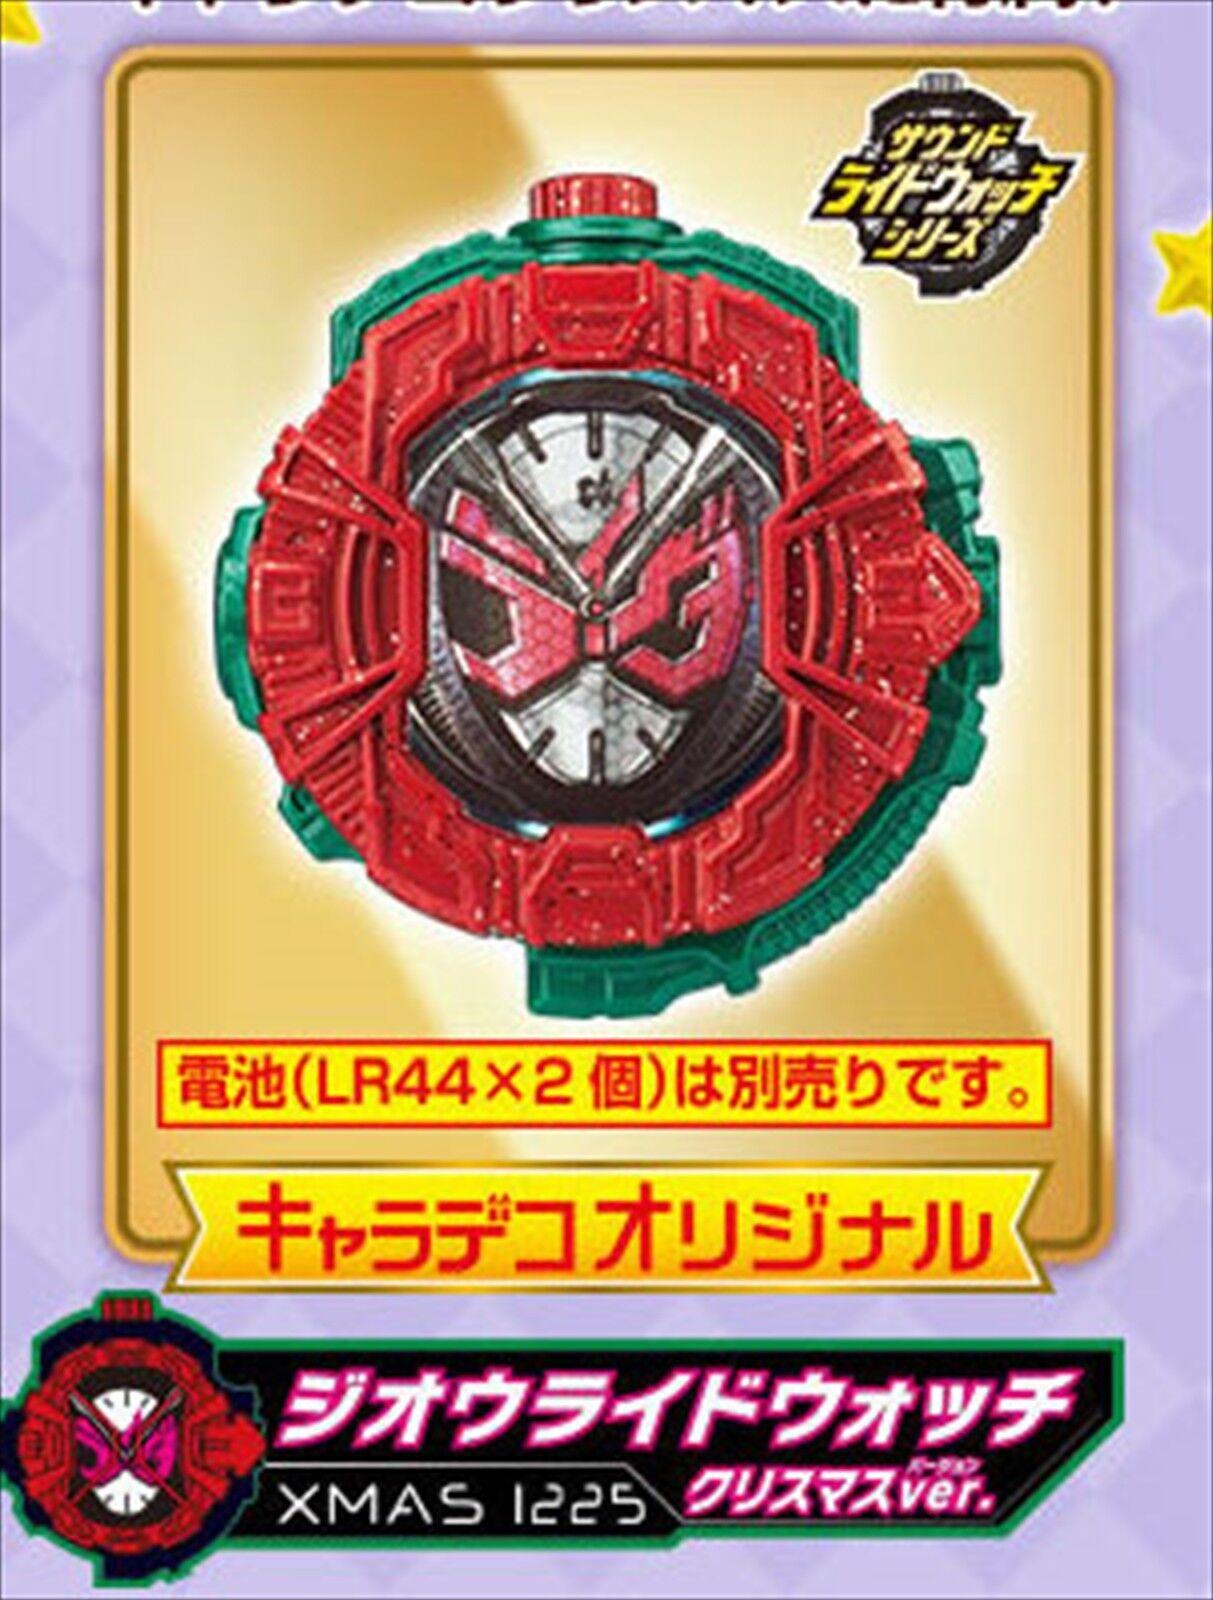 Kamen Rider ZI-O ride watch Christmas ver. sound ridewatch Charadeco limited